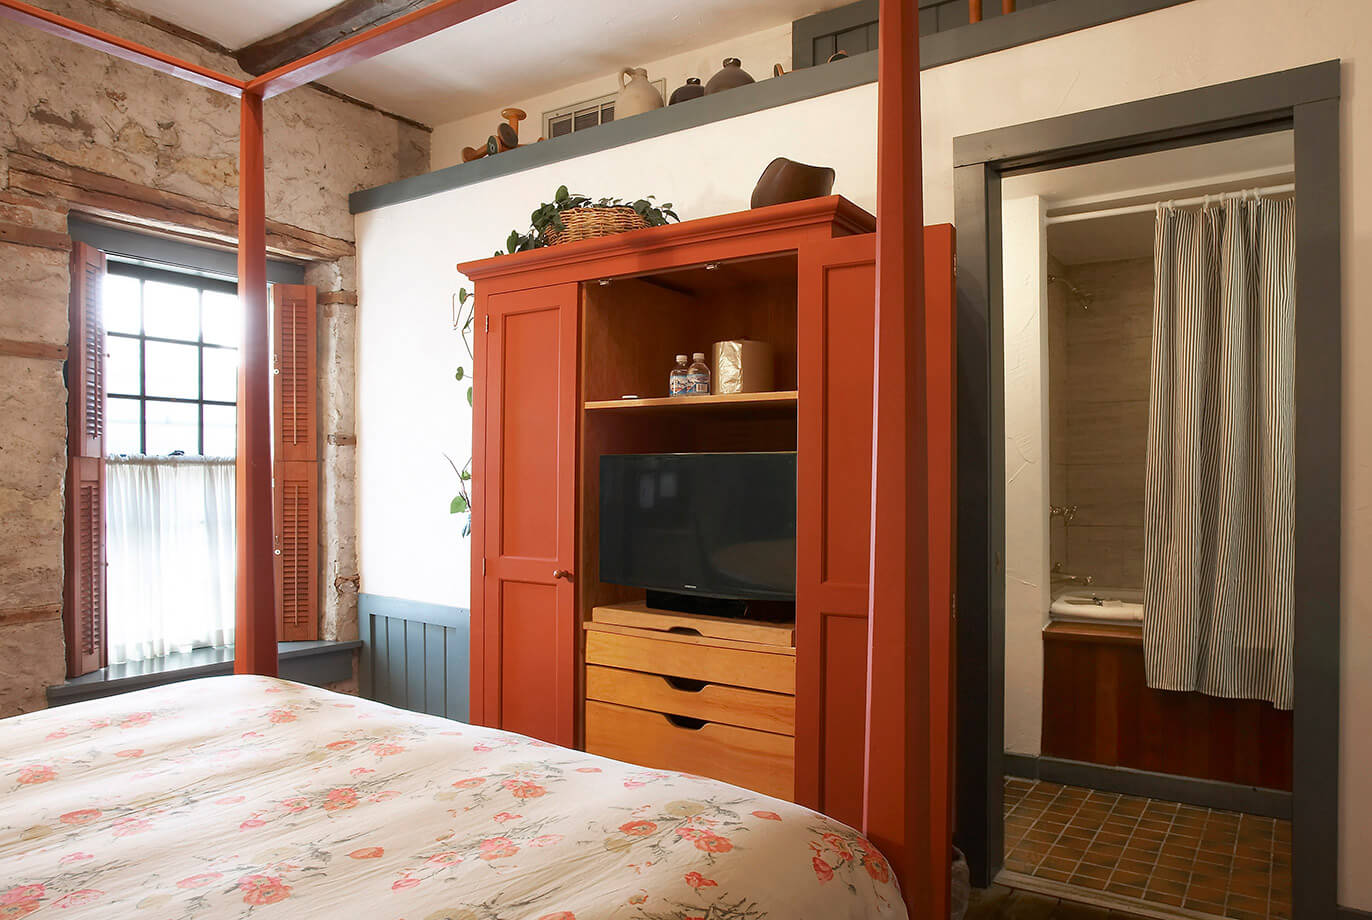 Room 211 - C. W. Lehmann